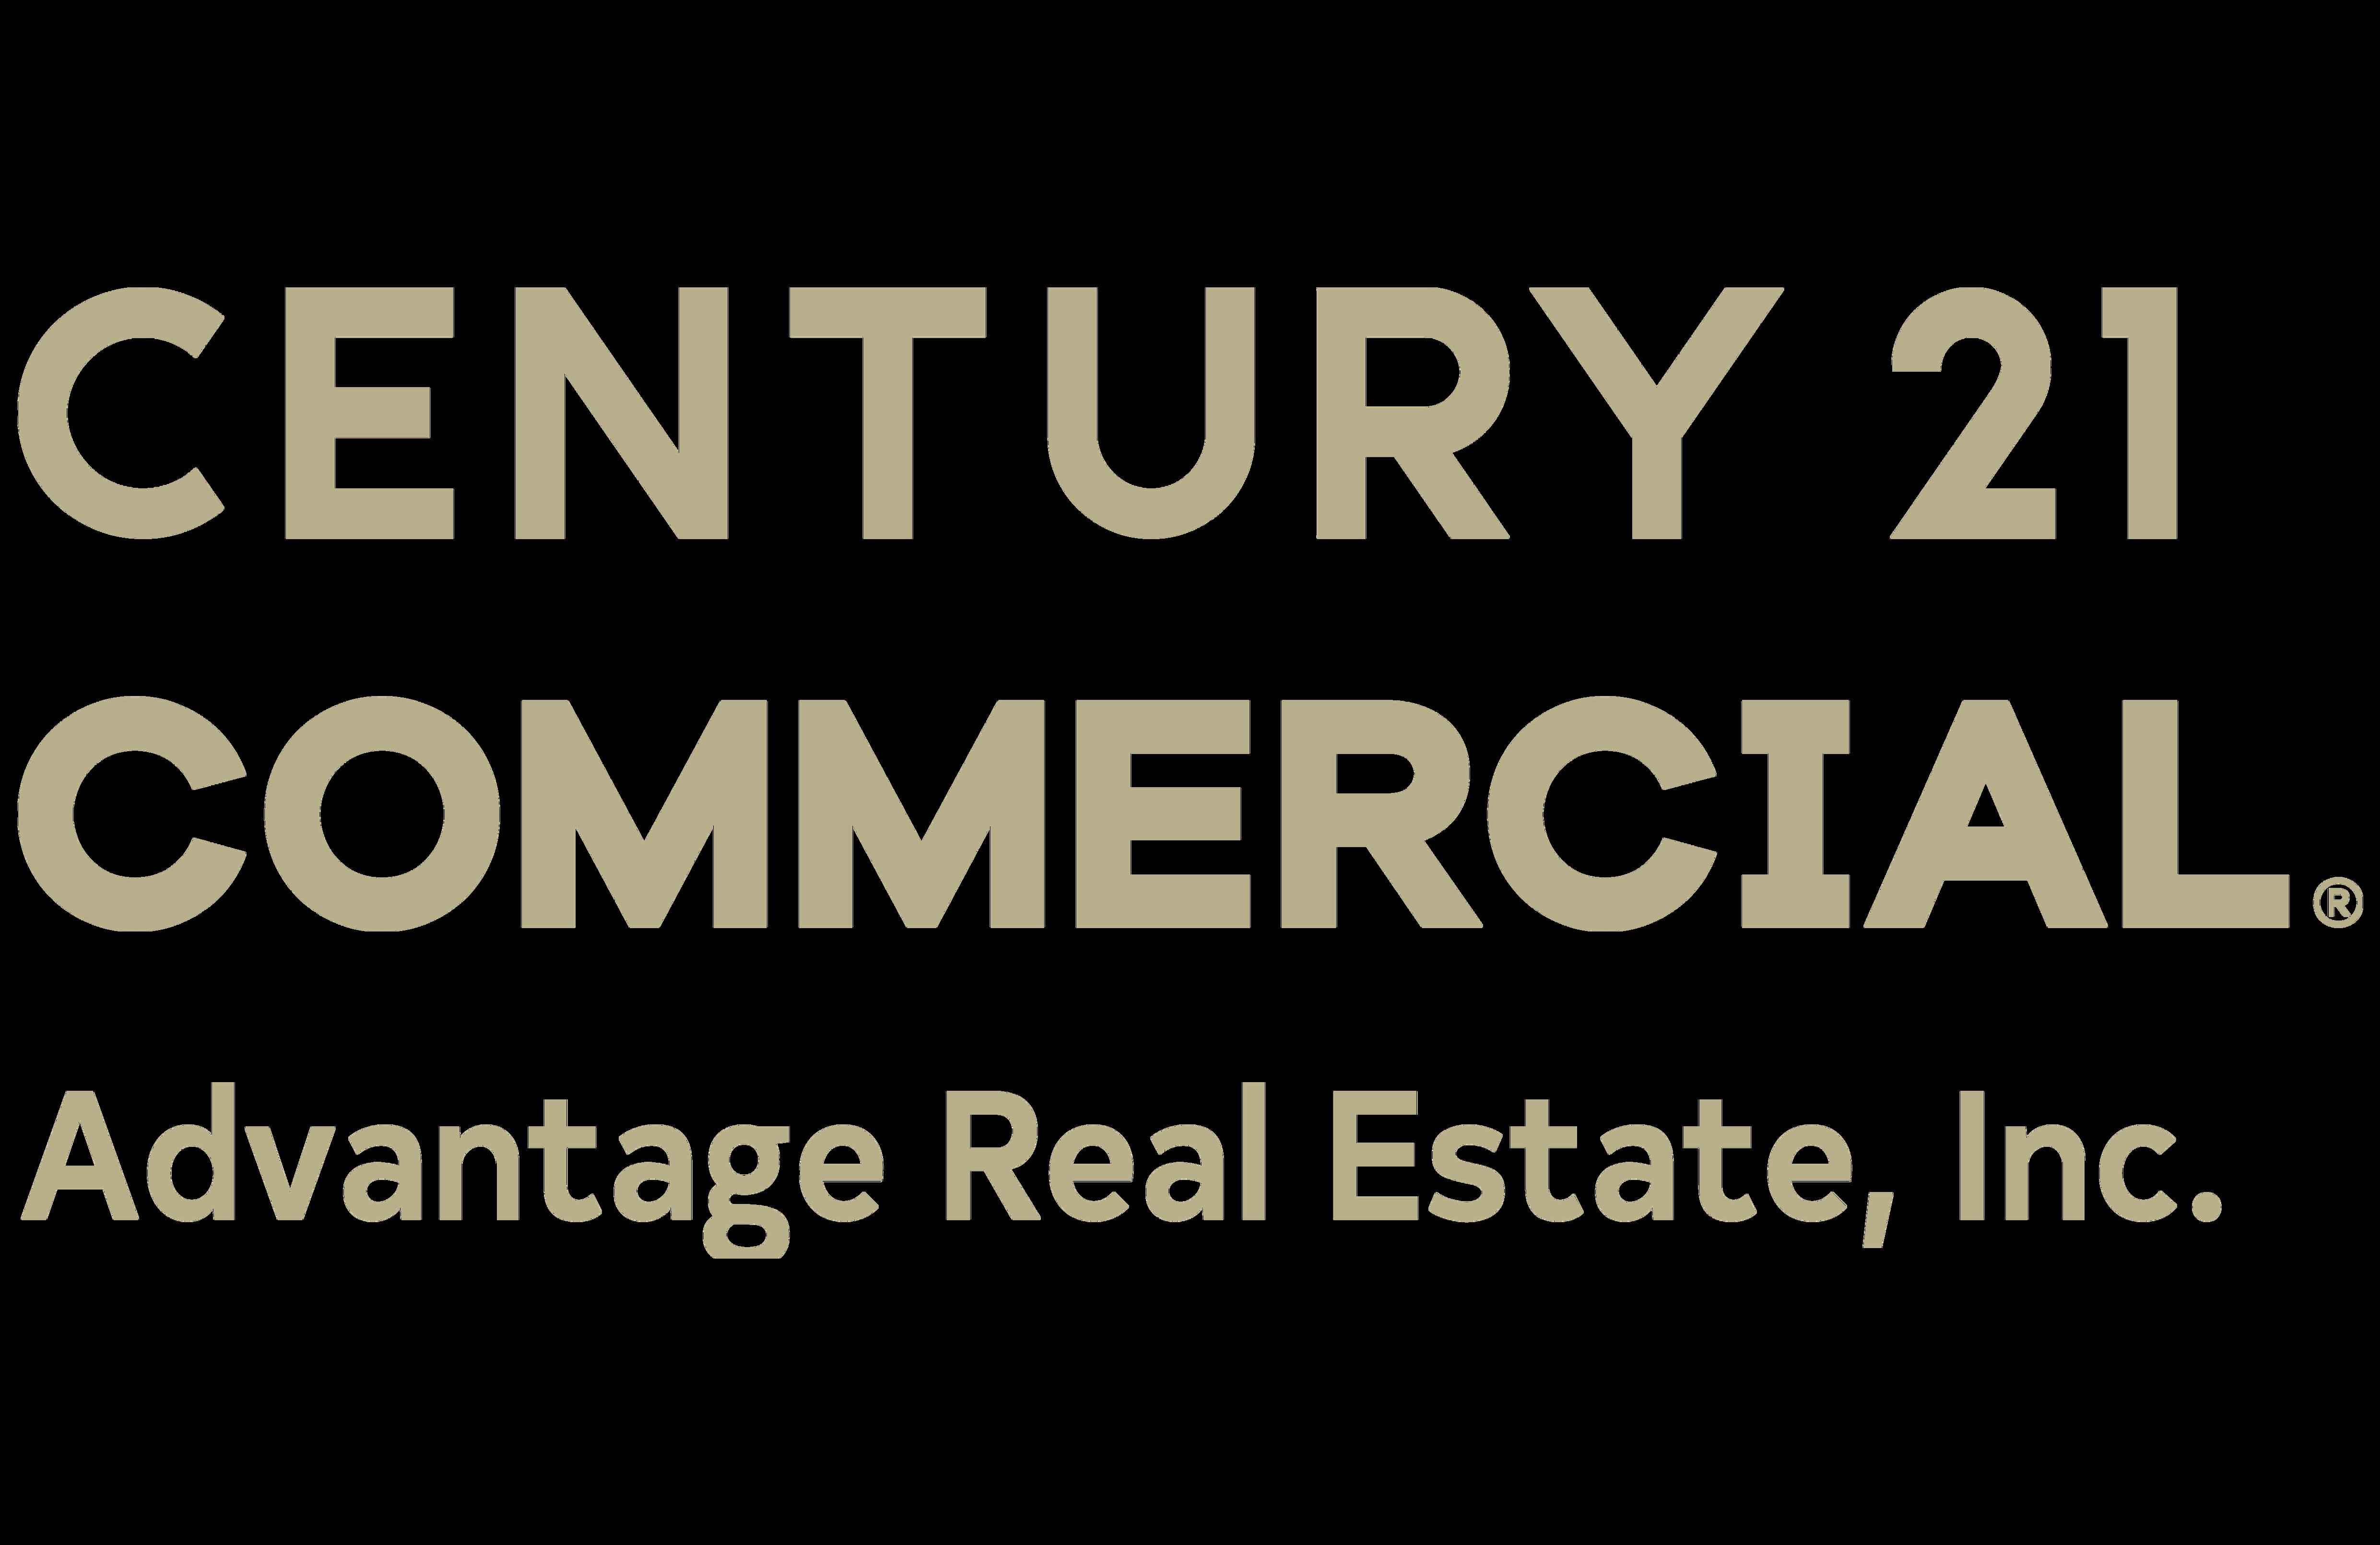 CENTURY 21 Advantage Real Estate, Inc.